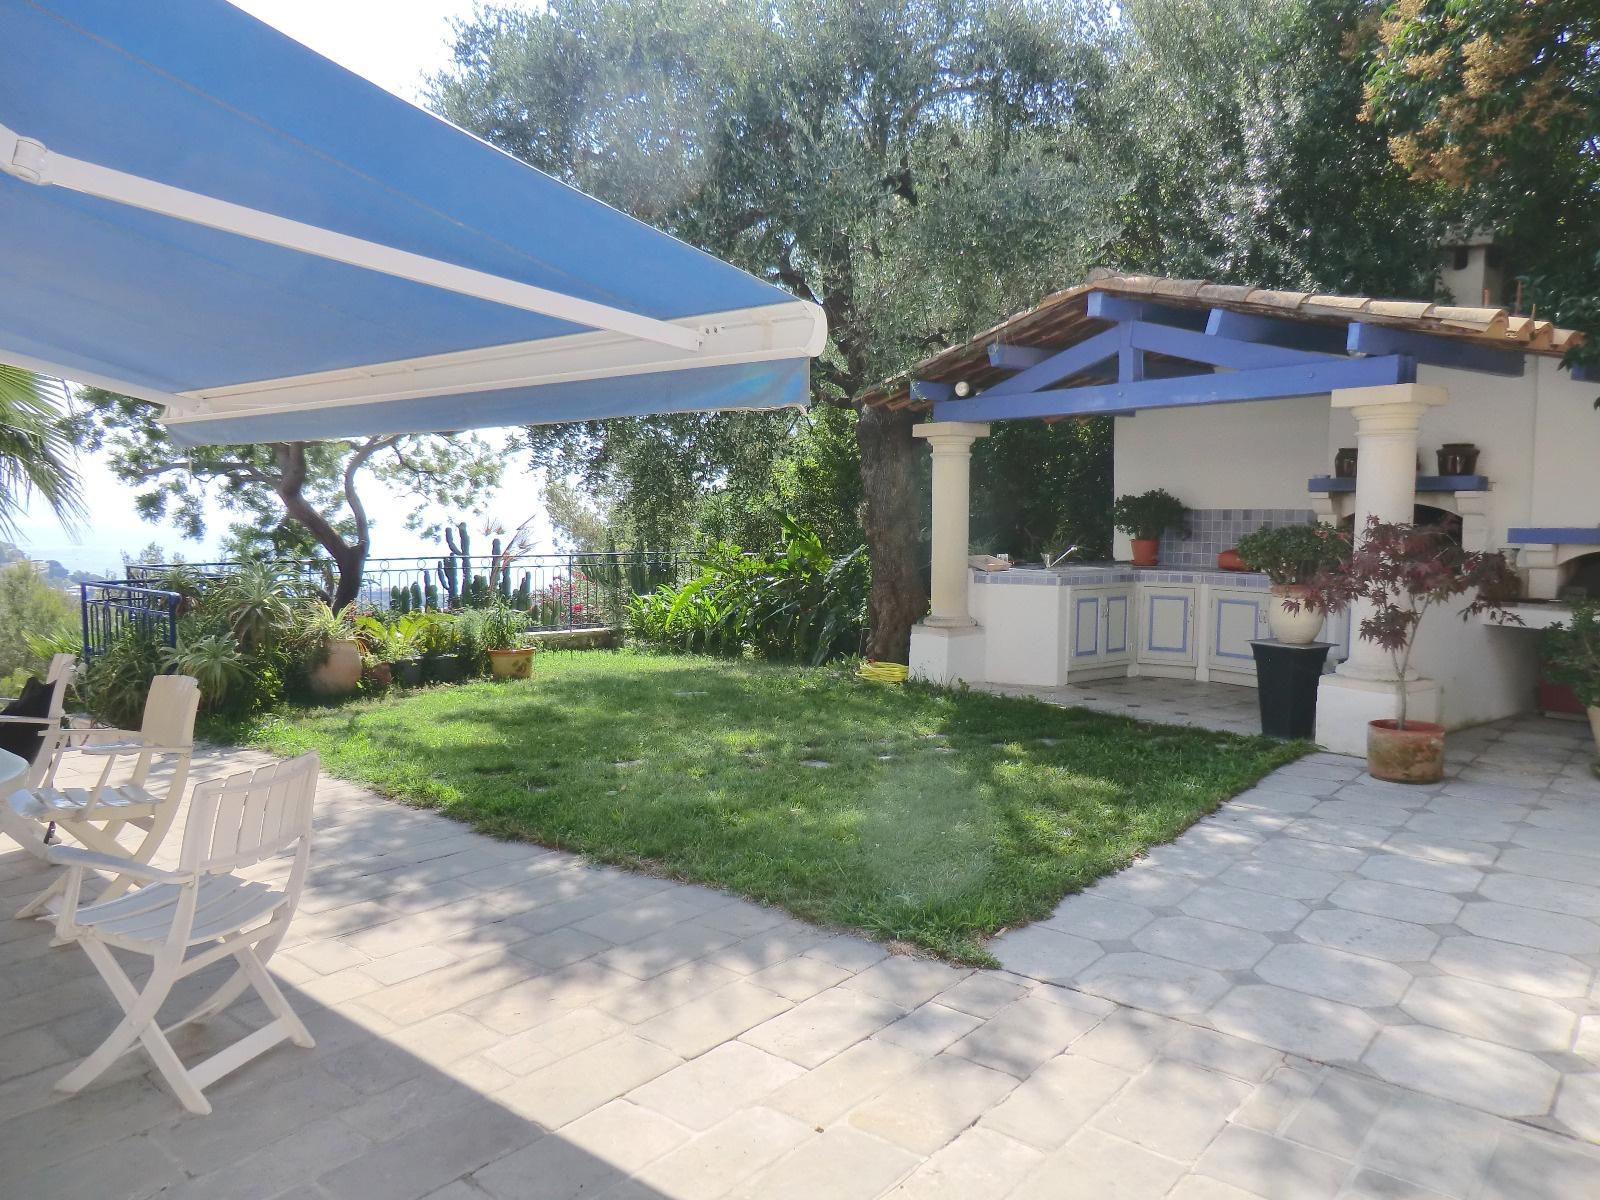 Vente roquebrune cap martin maison de 380 m2 piscine for Azureva roquebrune cap martin piscine